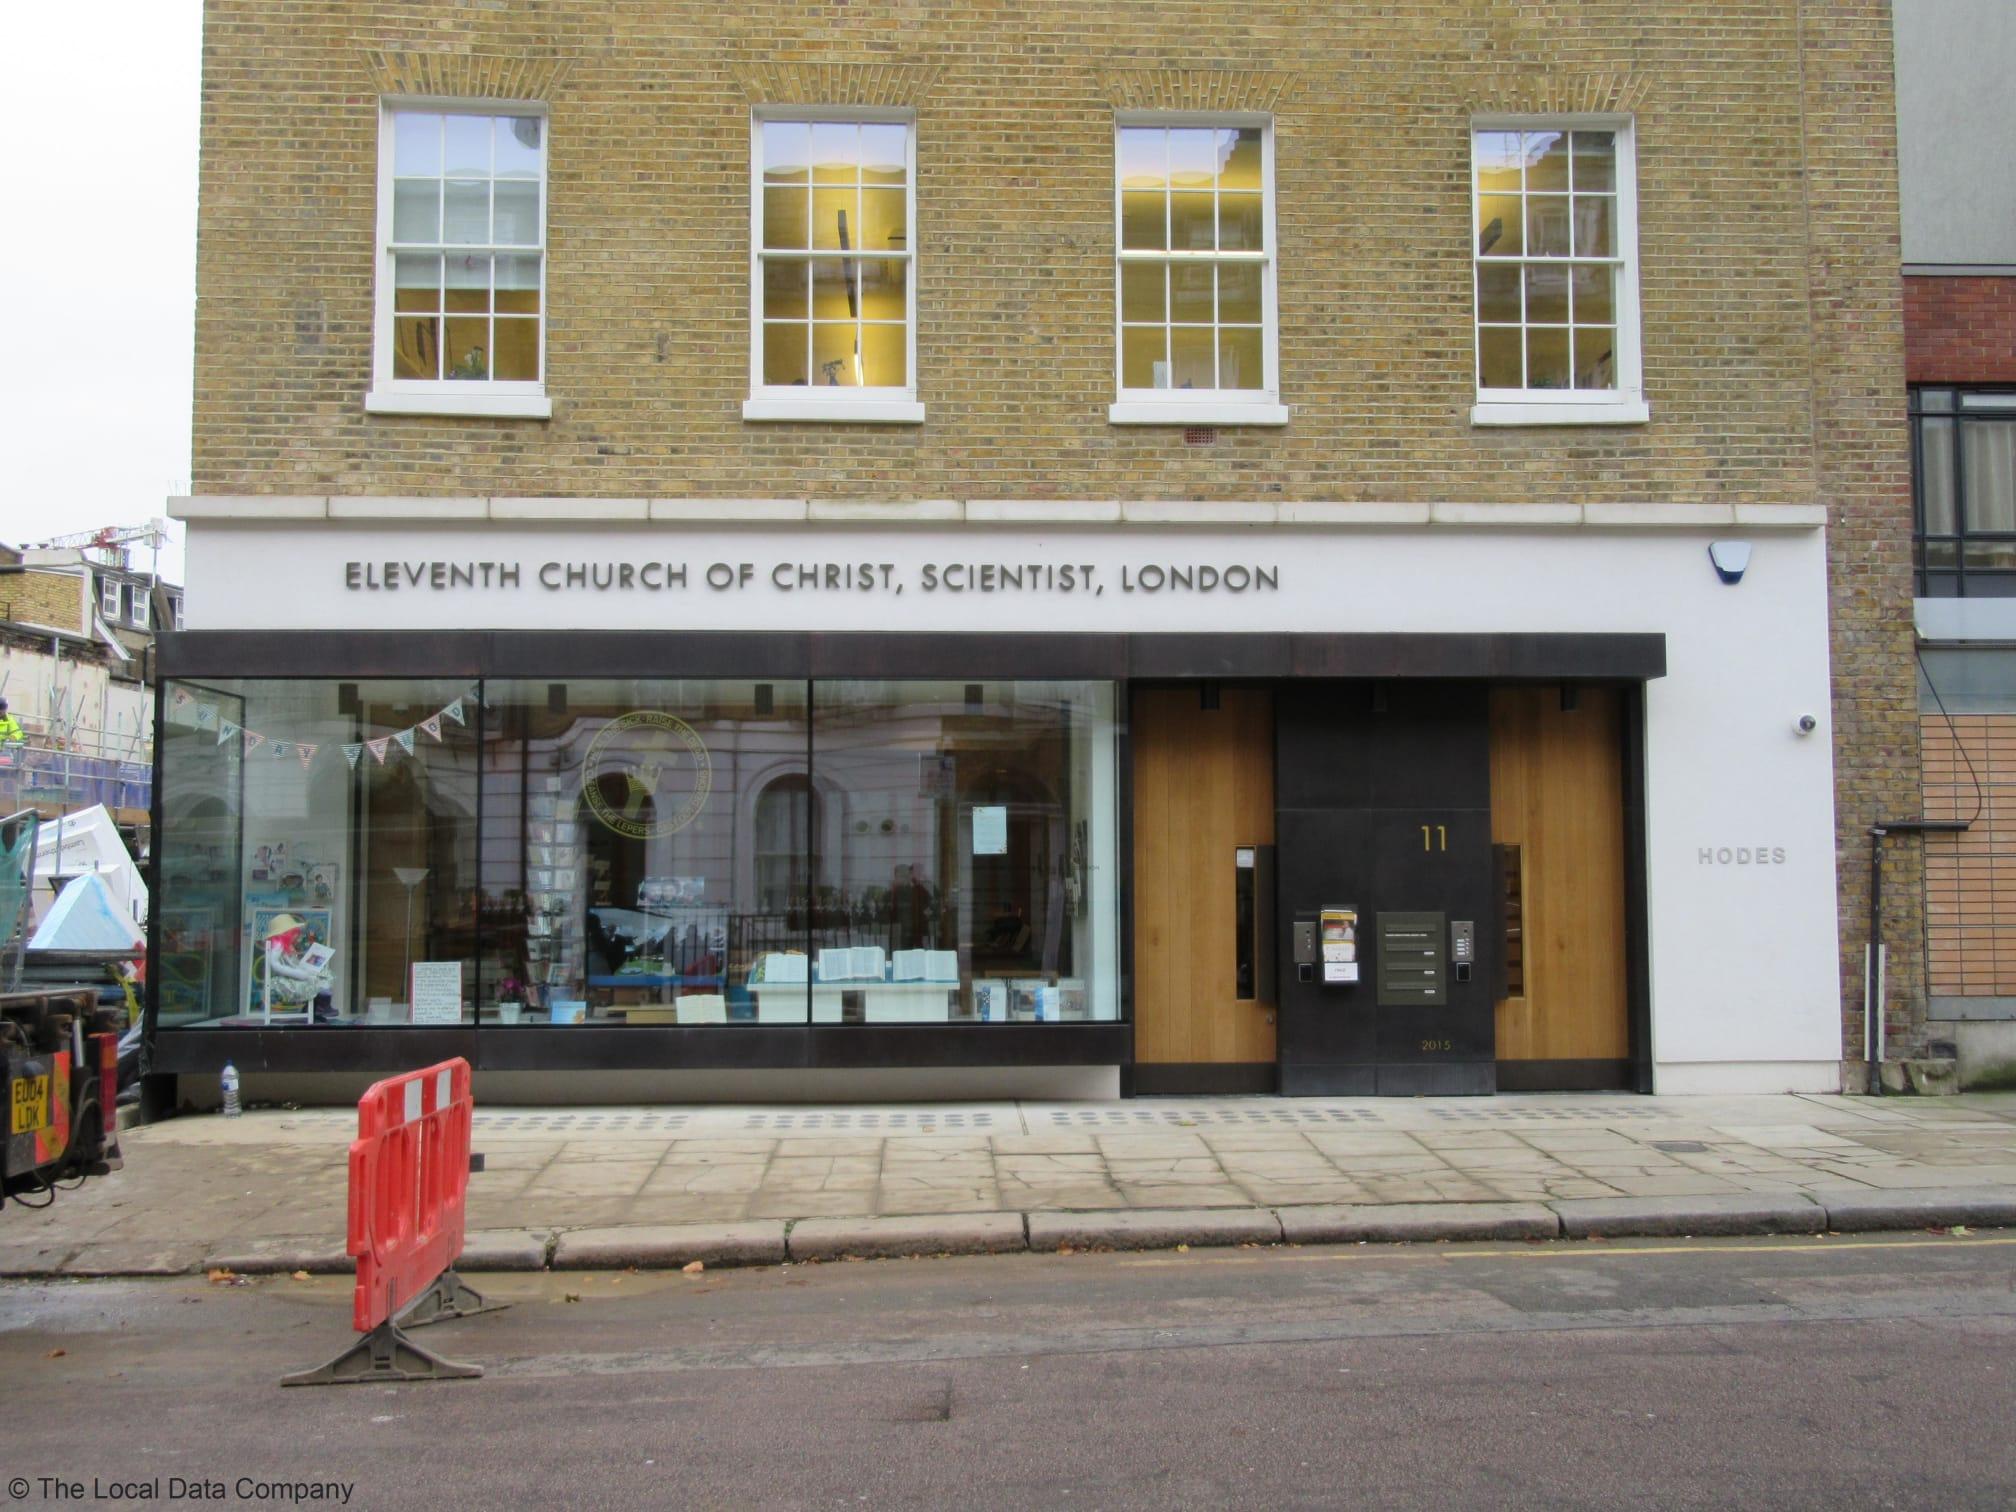 Eleventh Church Of Christ Scientist | 11 St. Chads Street Kings Cross, London WC1H 8BG | +44 20 7837 0669